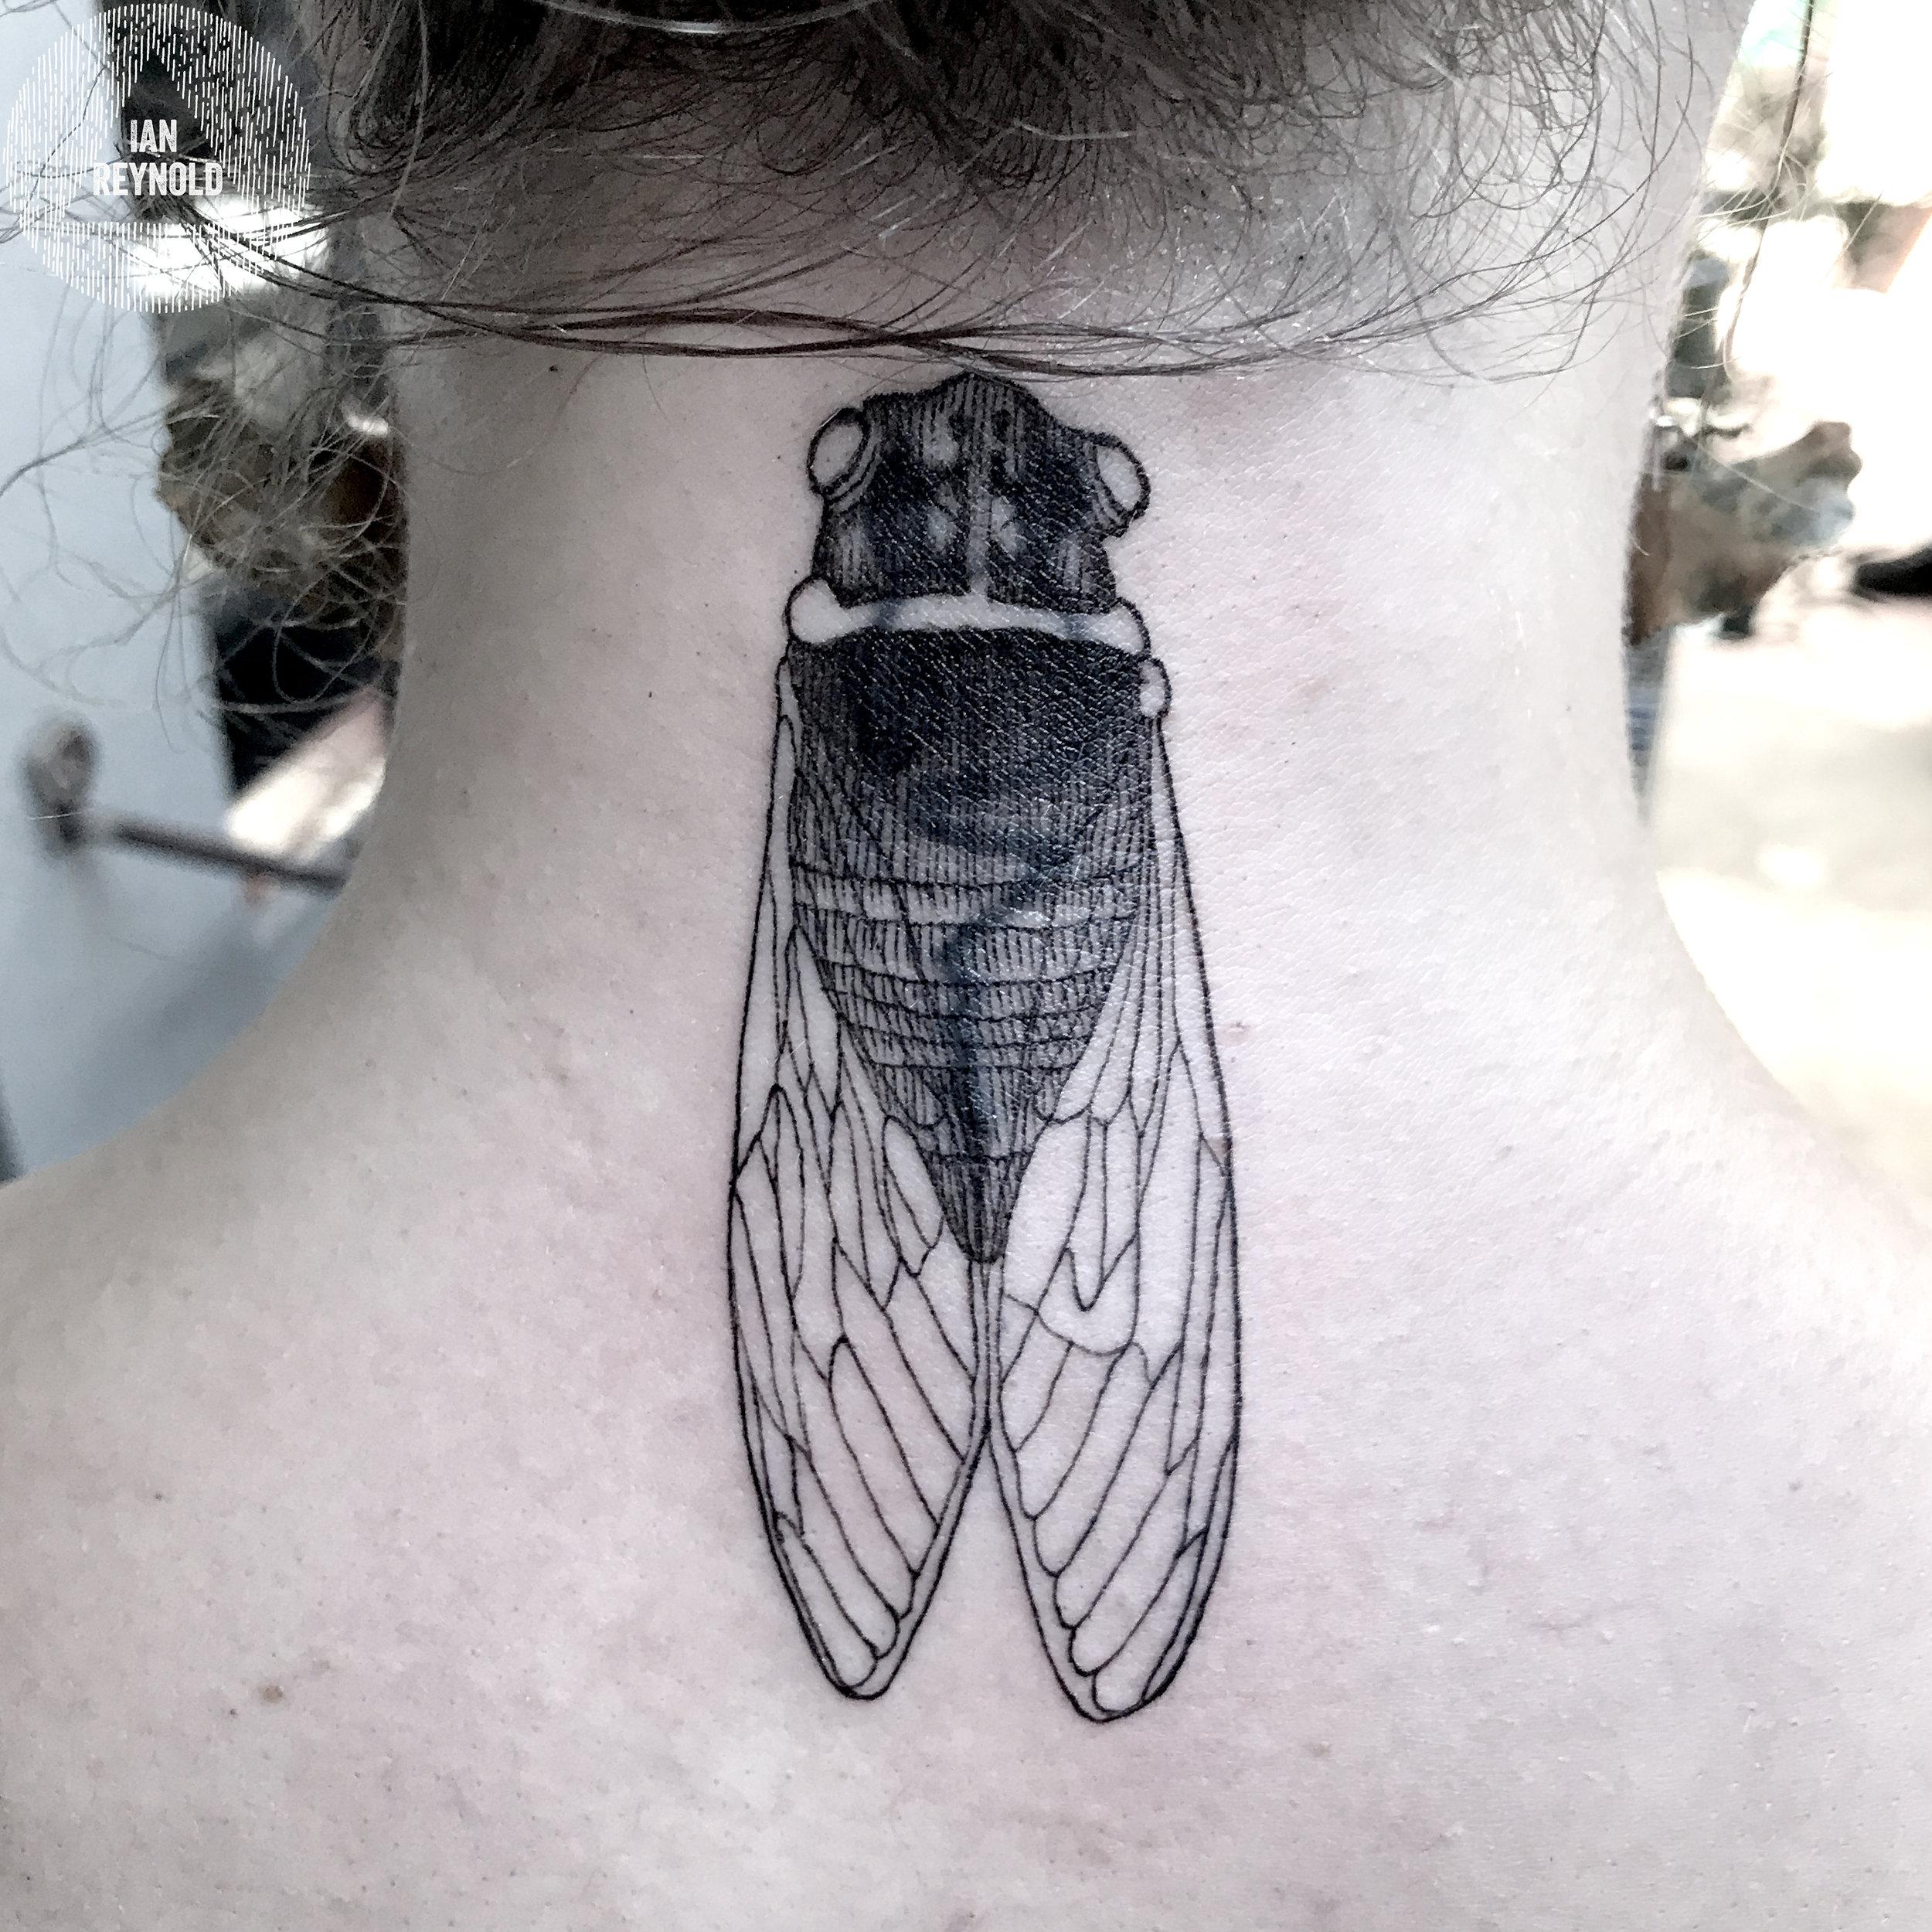 Blackened Cicada